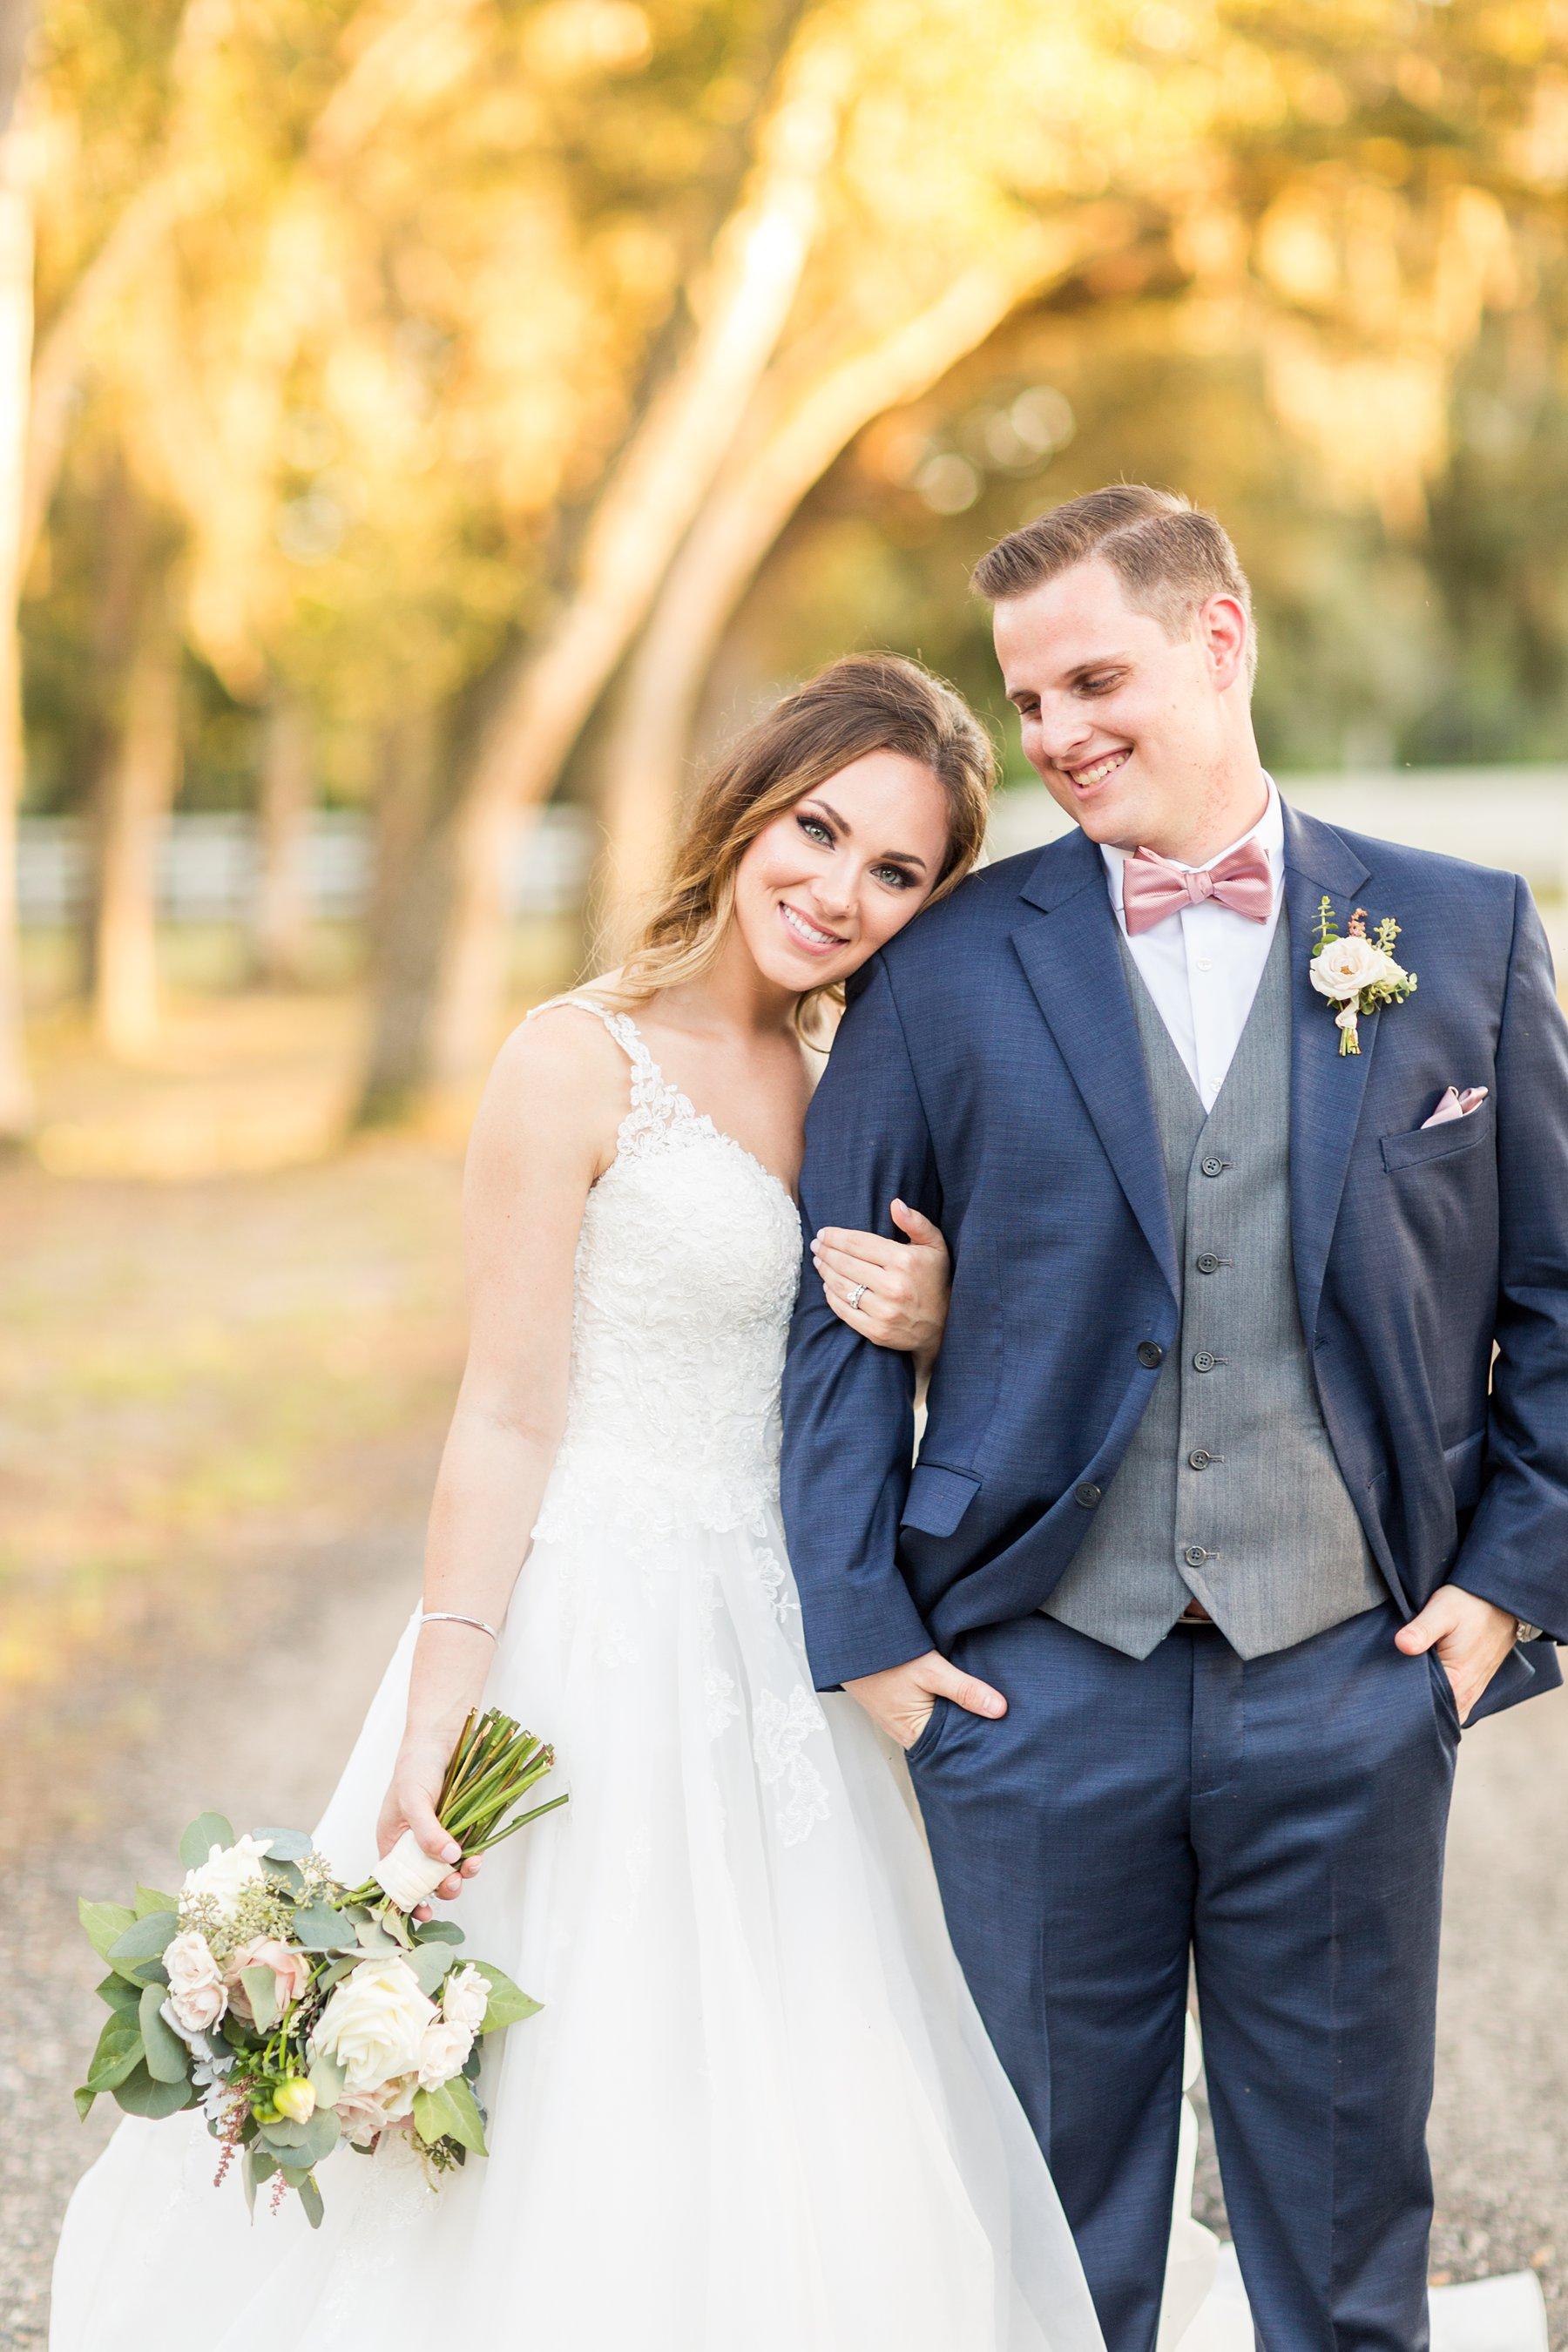 Chandler Oaks Barn Wedding in St. Augustine - Bri Cibene ...